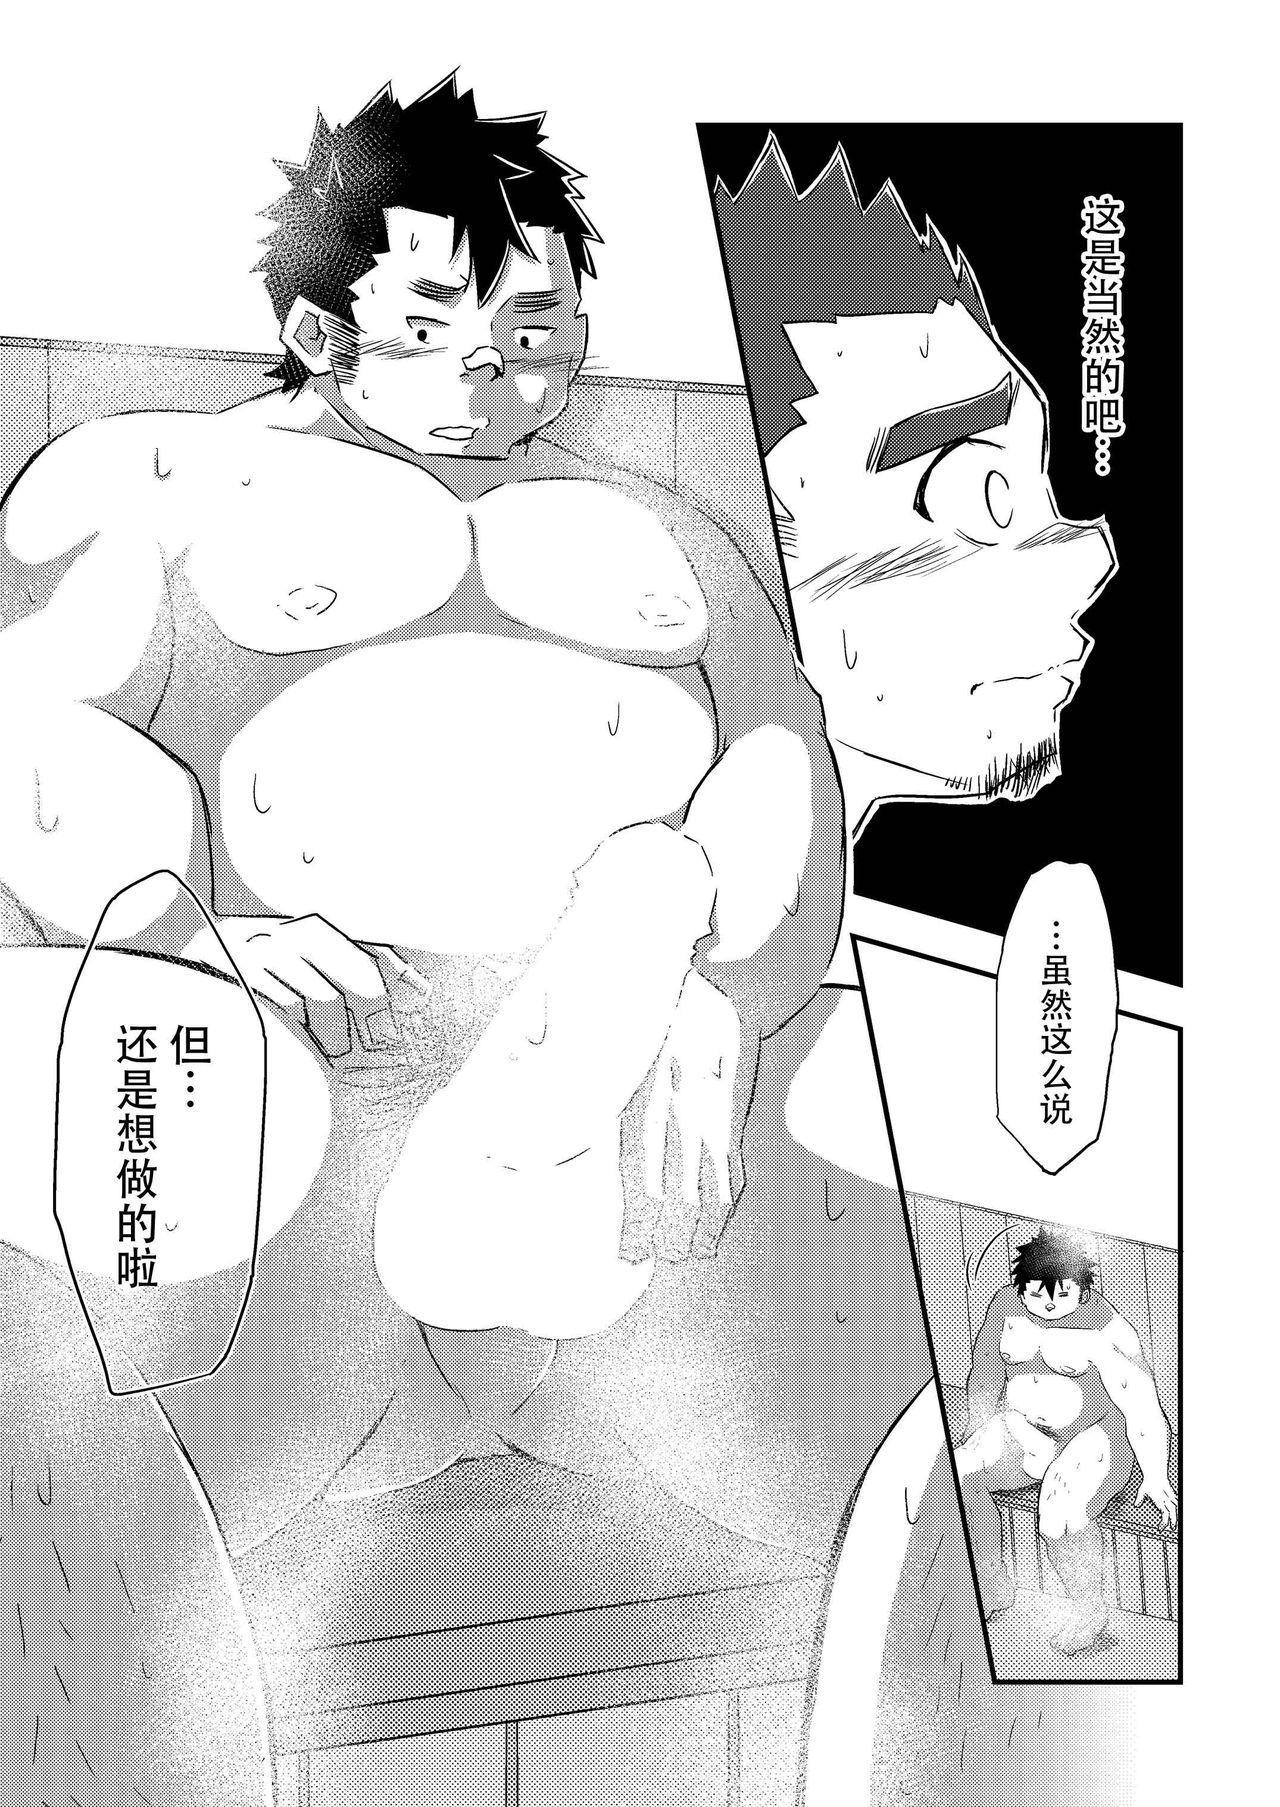 [CorkBOX (ngng)] Ise-kun wa Tamatte Iru. - Ise-kun is horny. [Chinese] {日曜日汉化} [Digital] 15